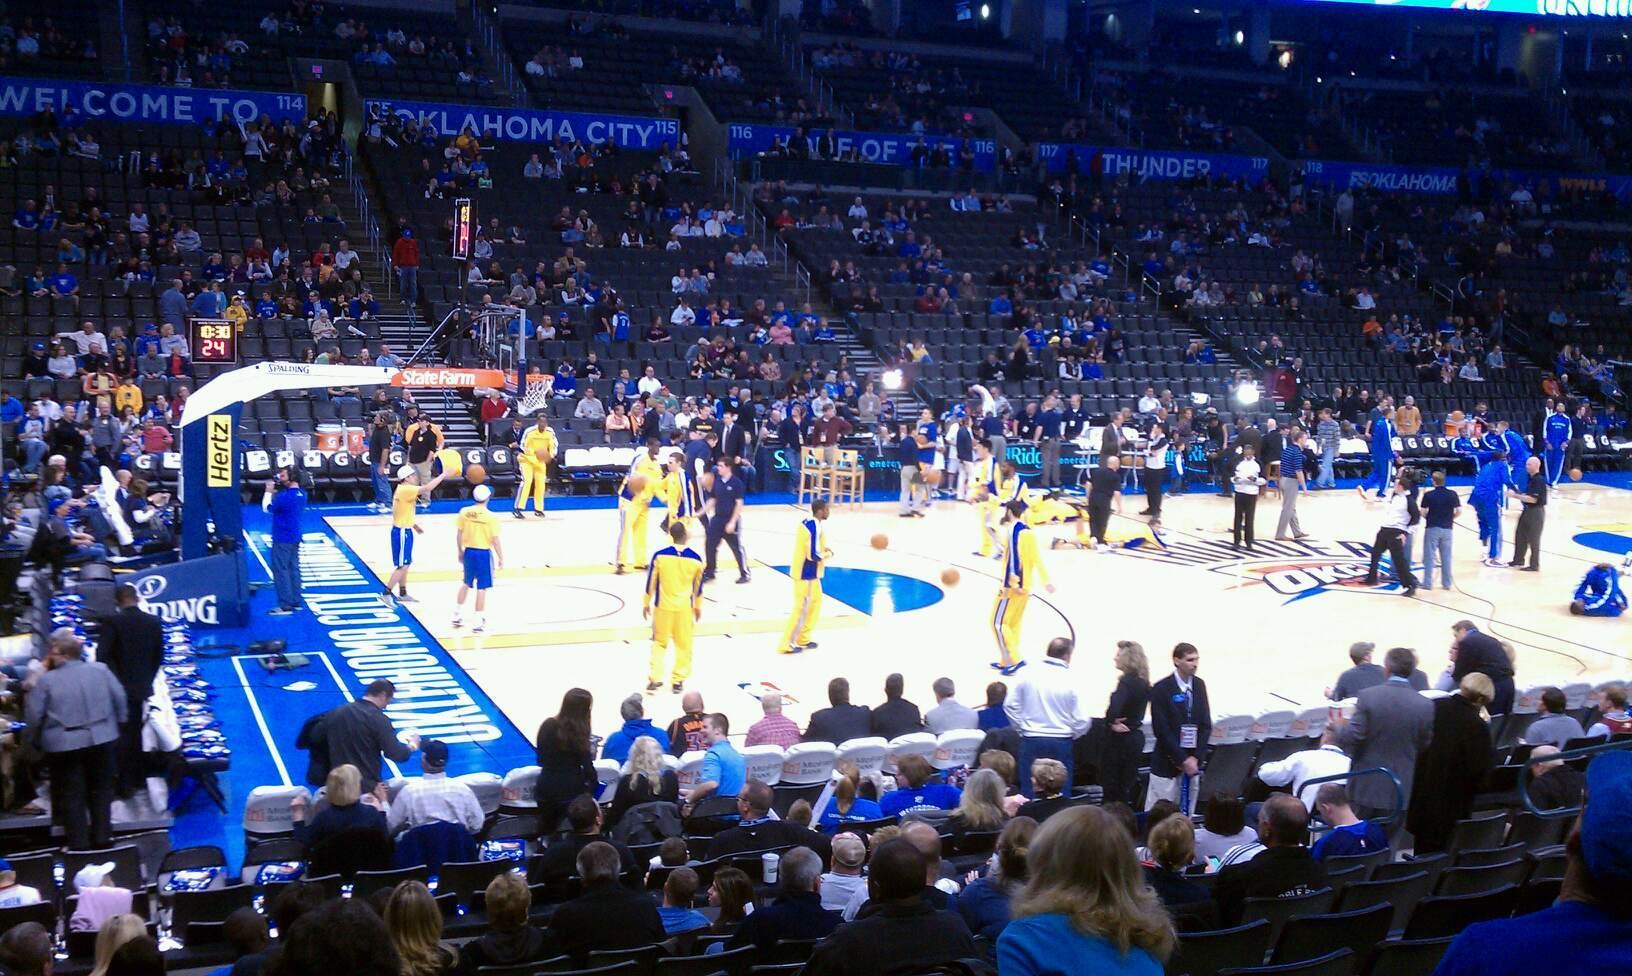 Chesapeake Energy Arena Section 107 Row j Seat 11